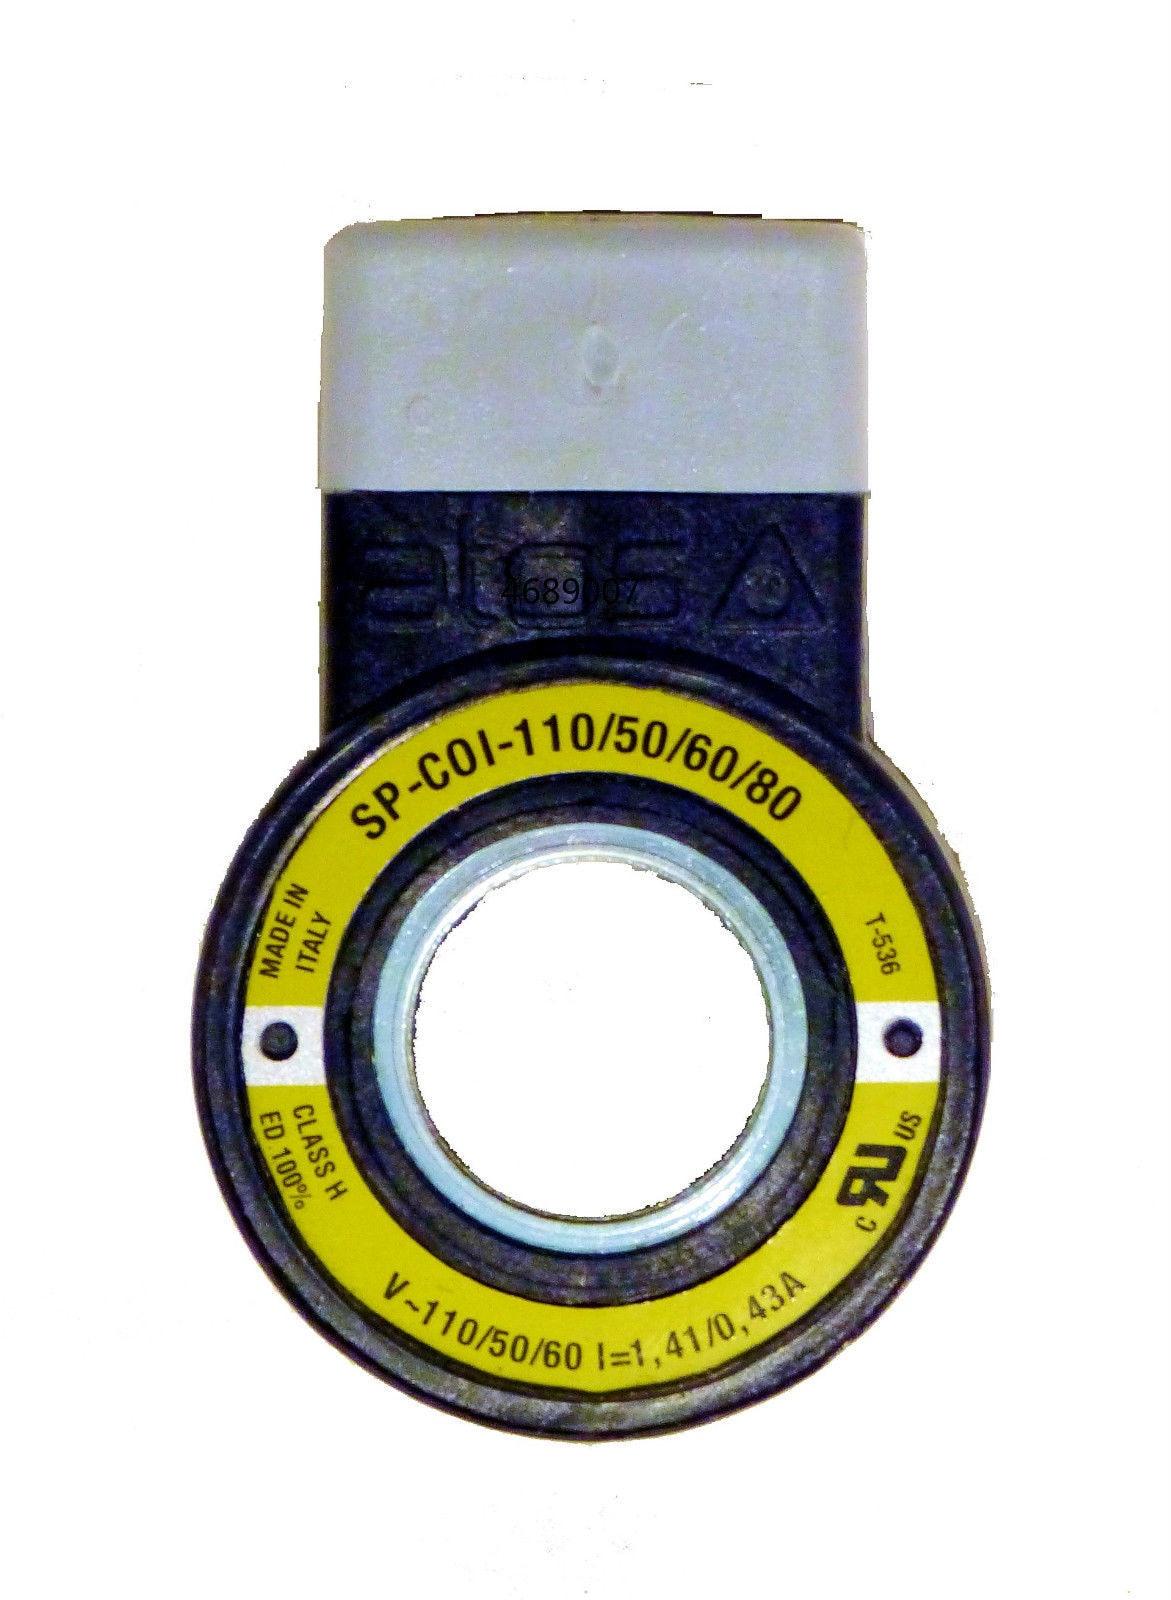 SP-COI-110//50//60AC Atos Magnet-Spule Ventil solenoid coil valve